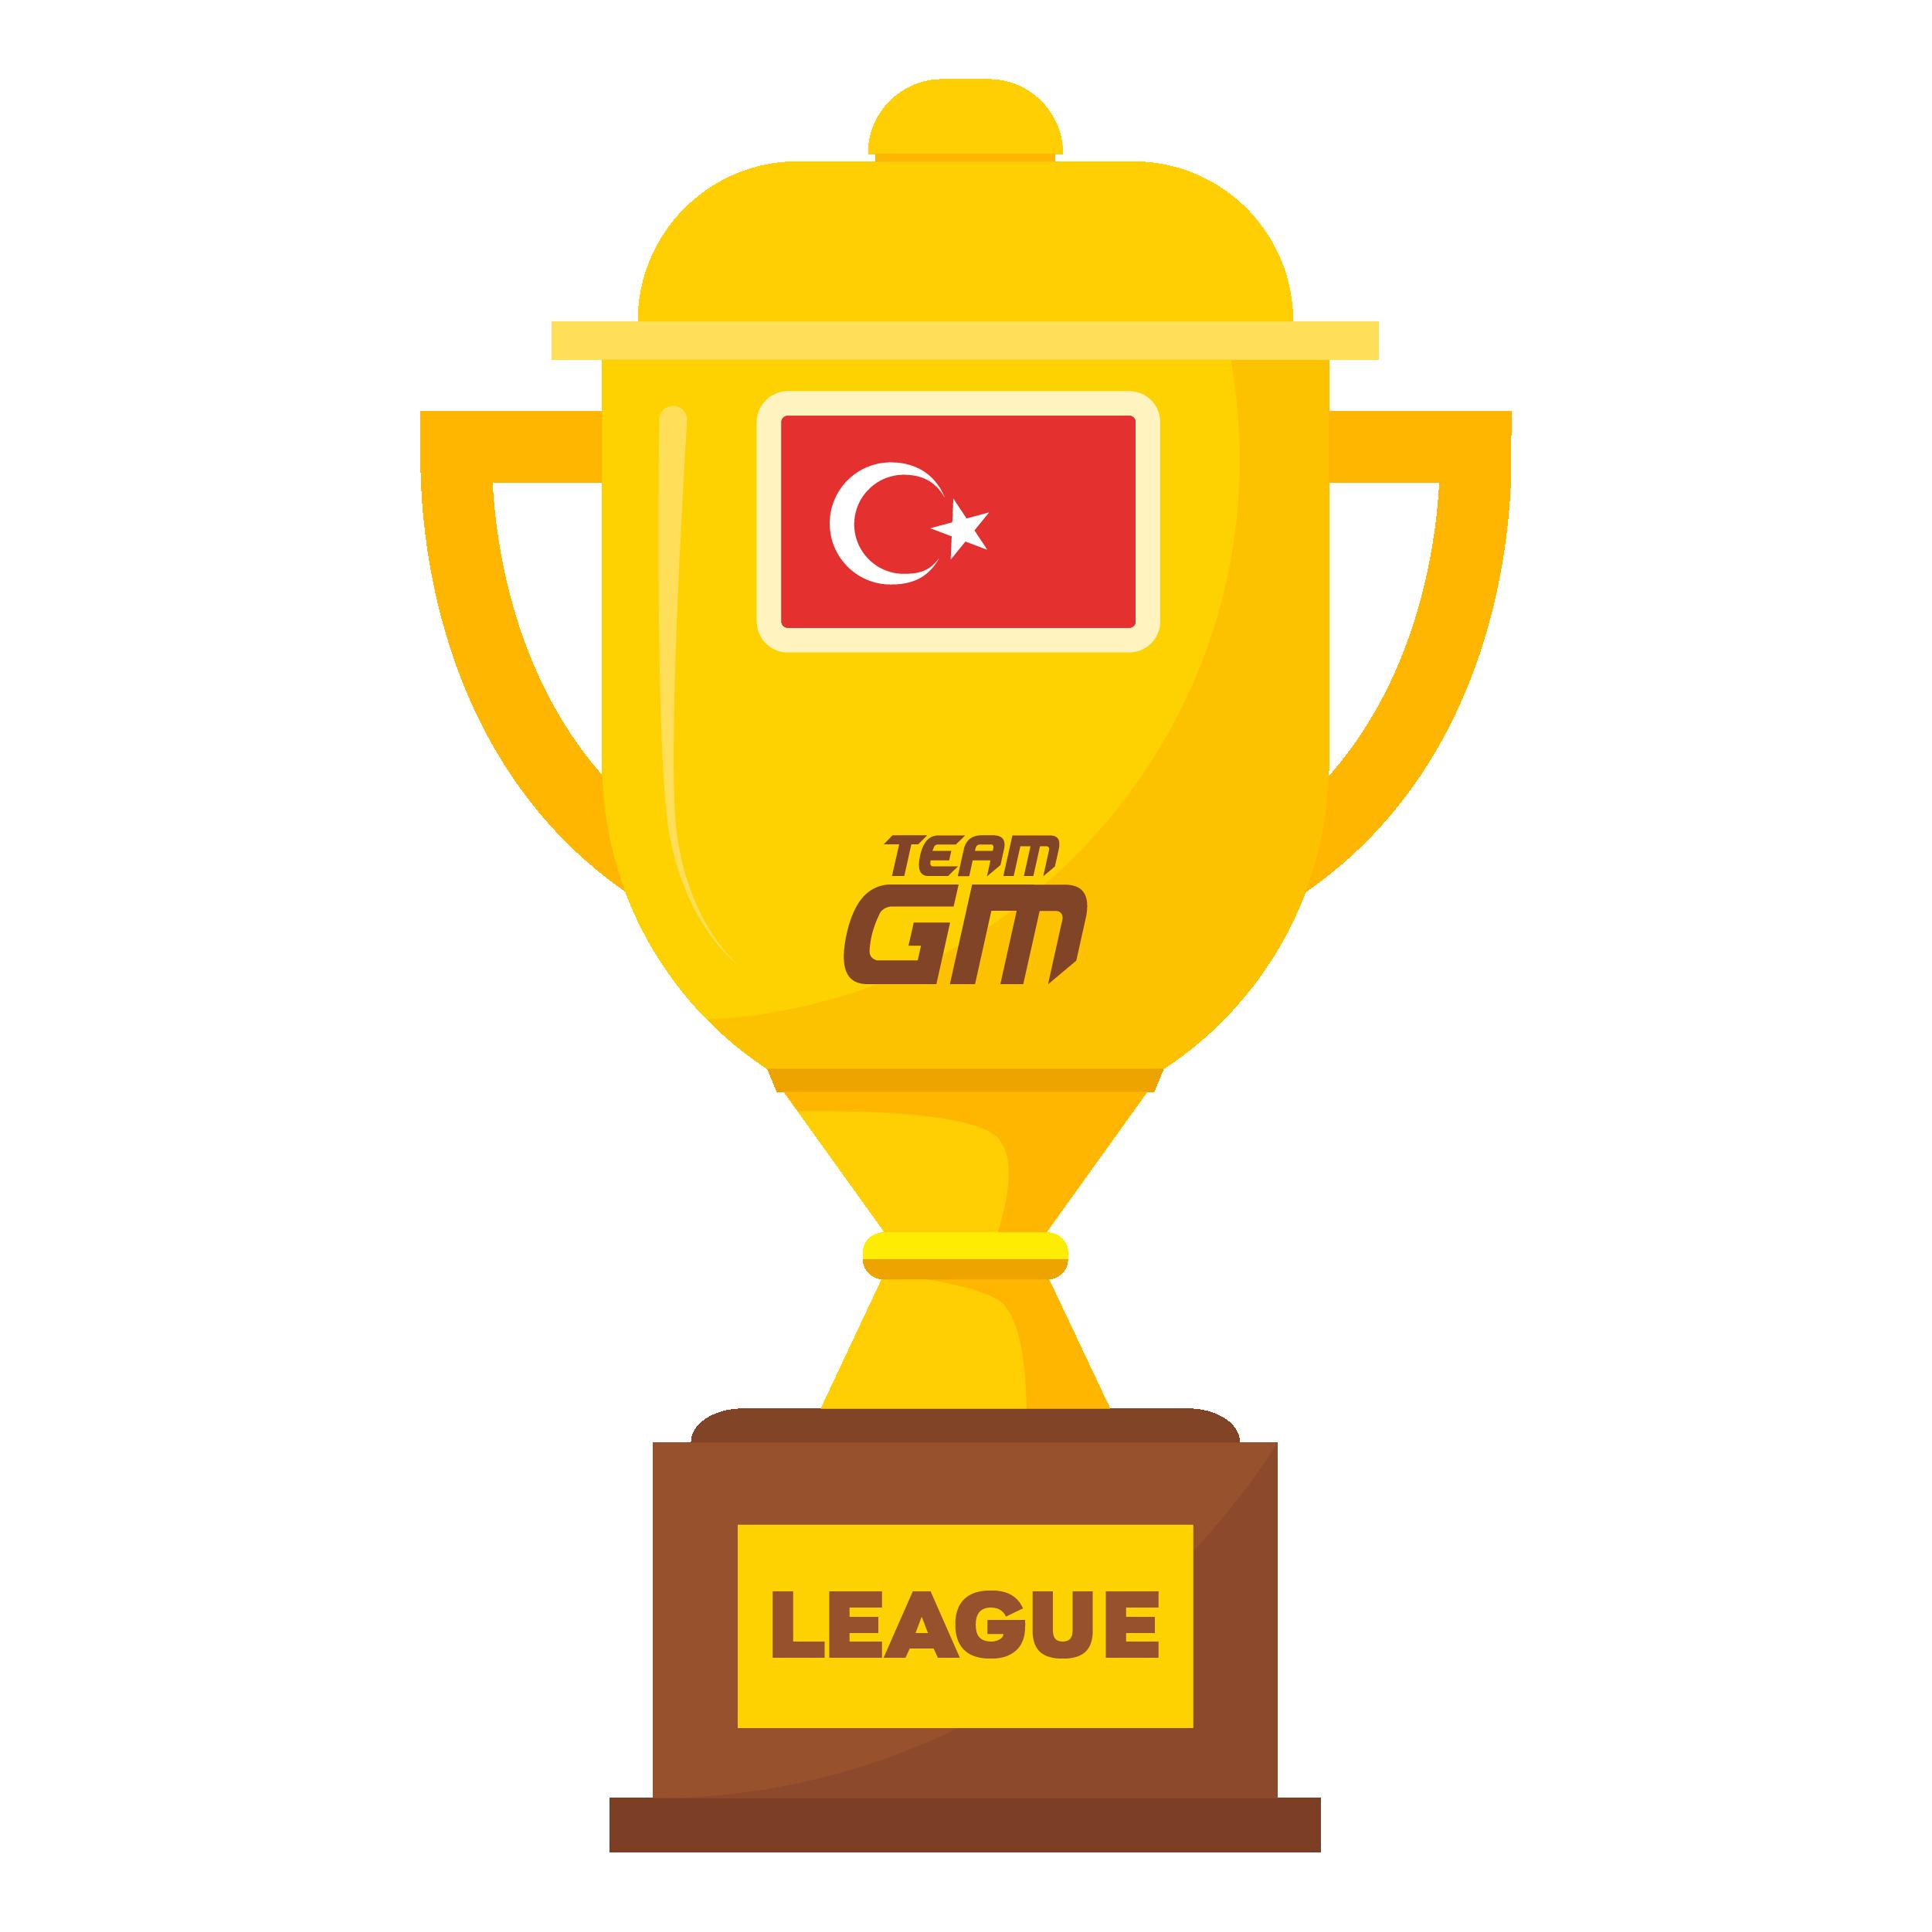 4TH - TURKISH LEAGUE